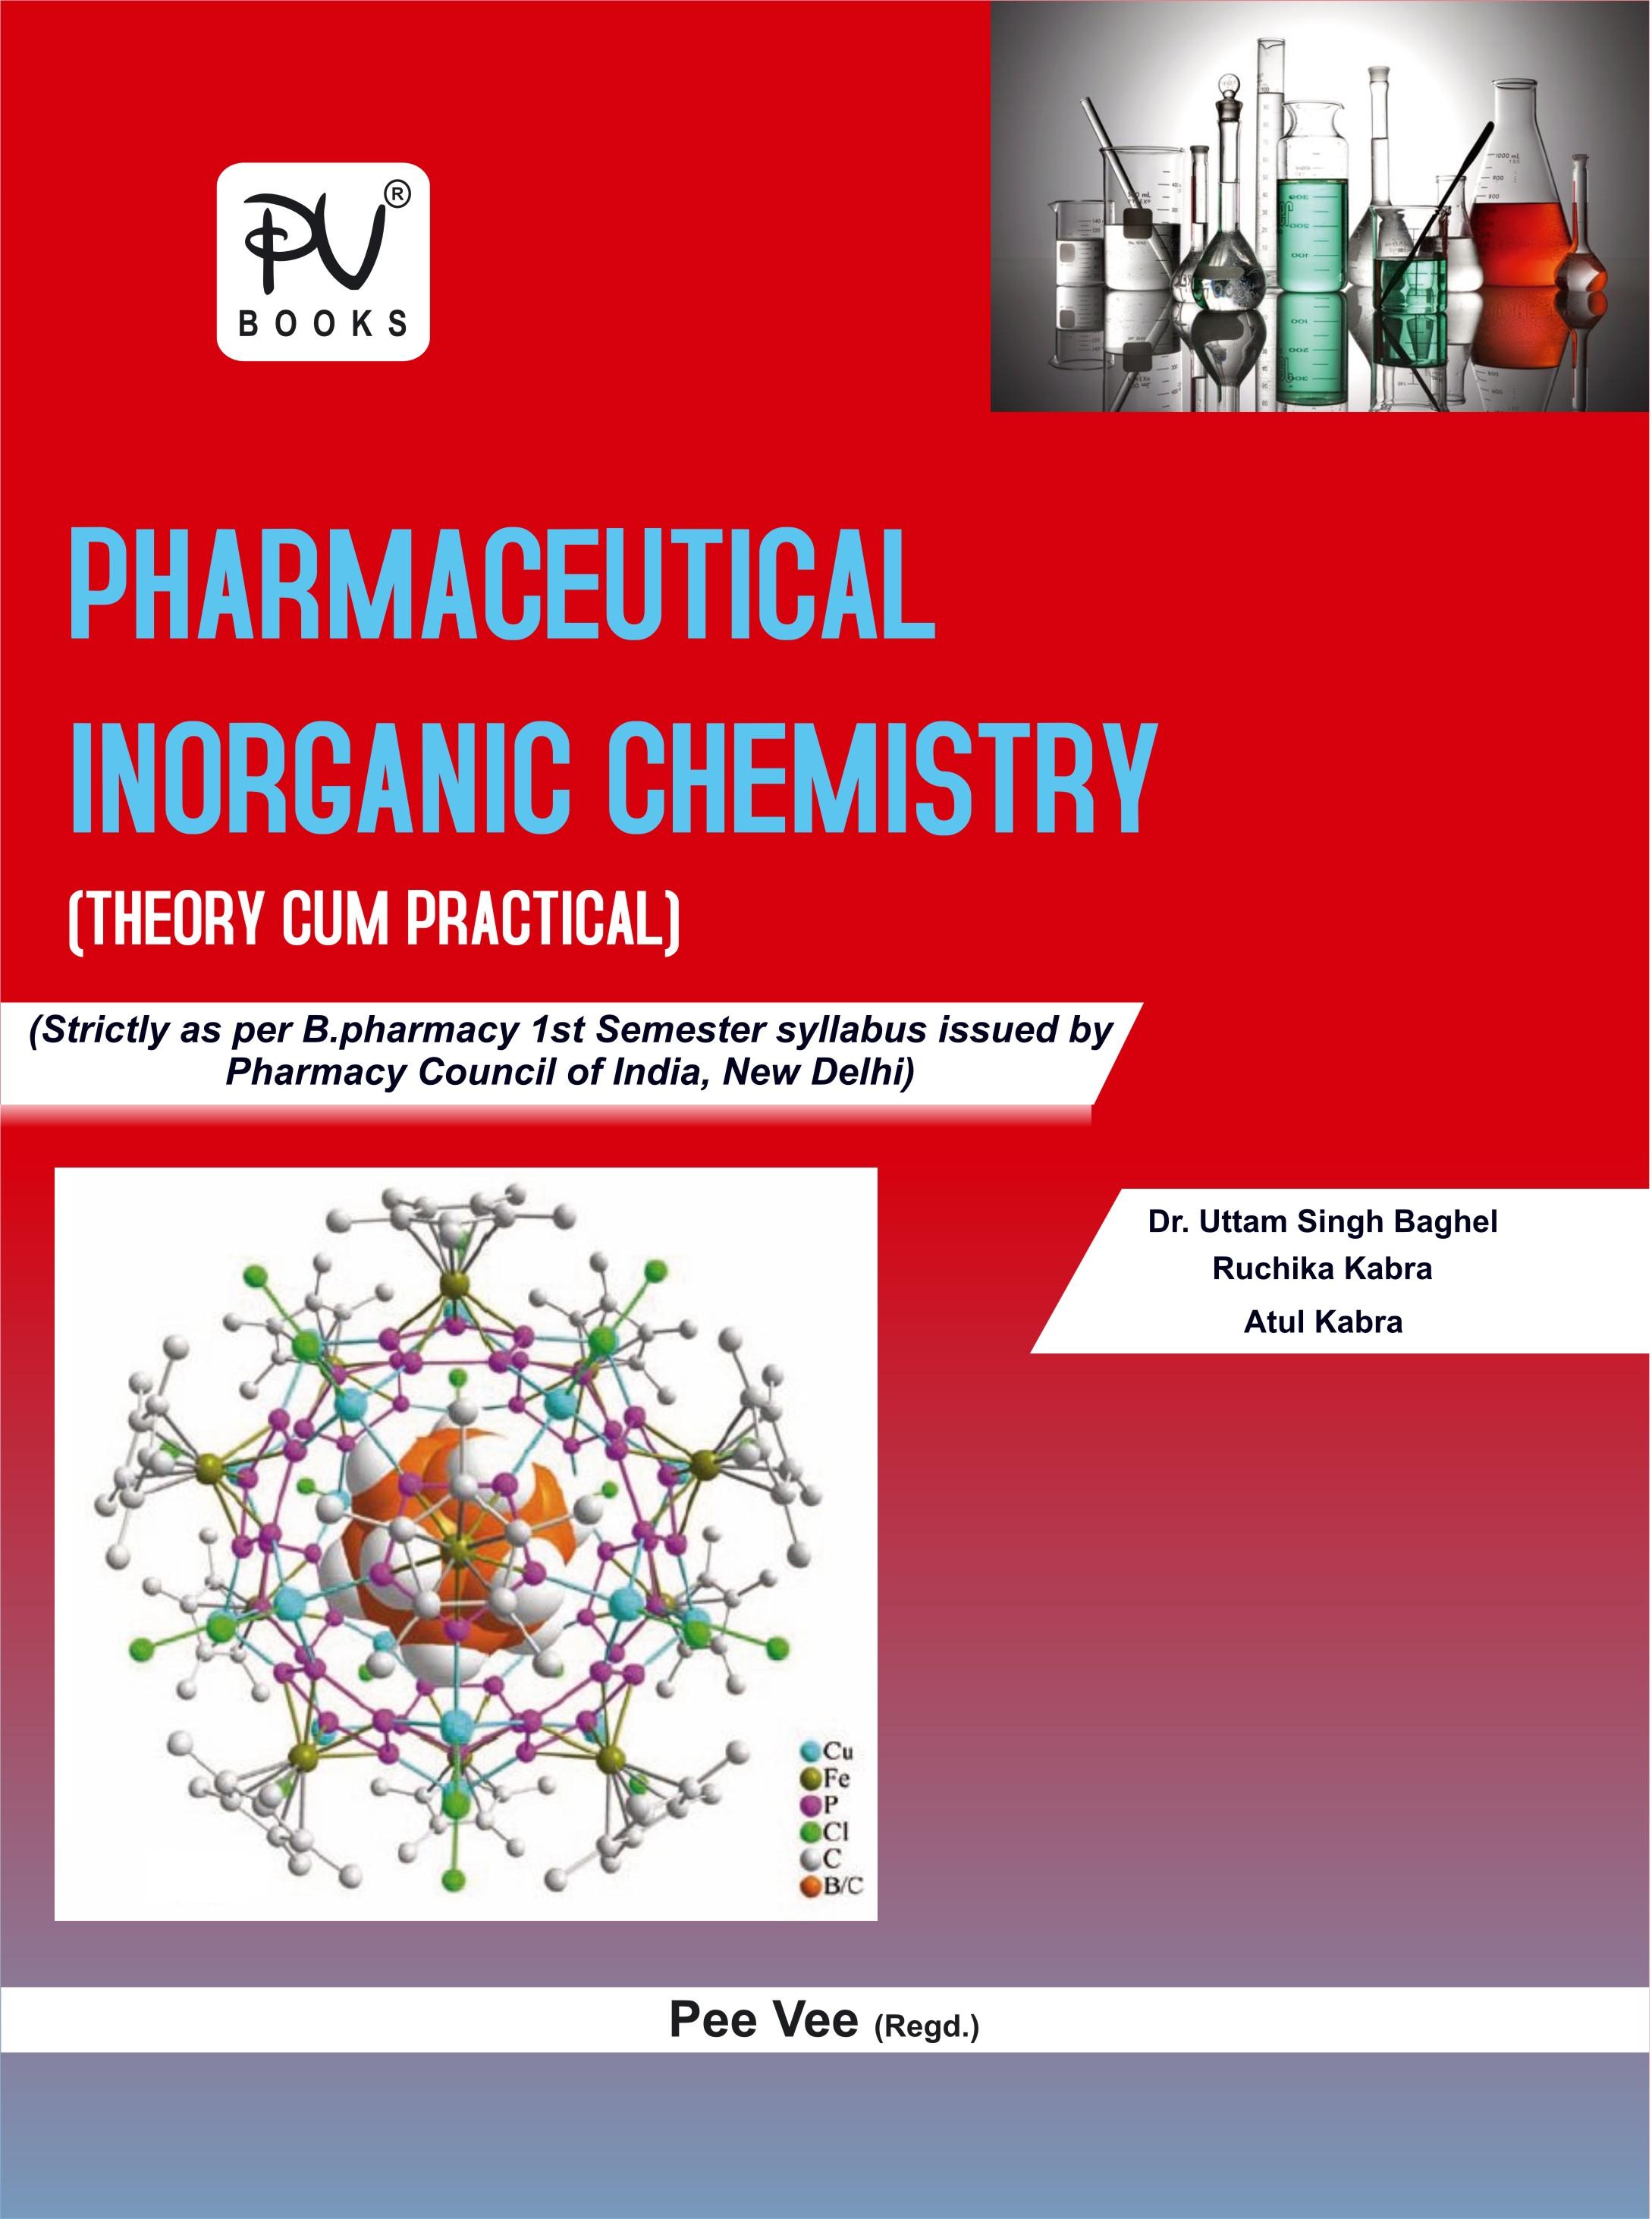 PHARMACEUTICAL INORGANIC CHEMISTRY (B PHARM) (SEMESTER-I)